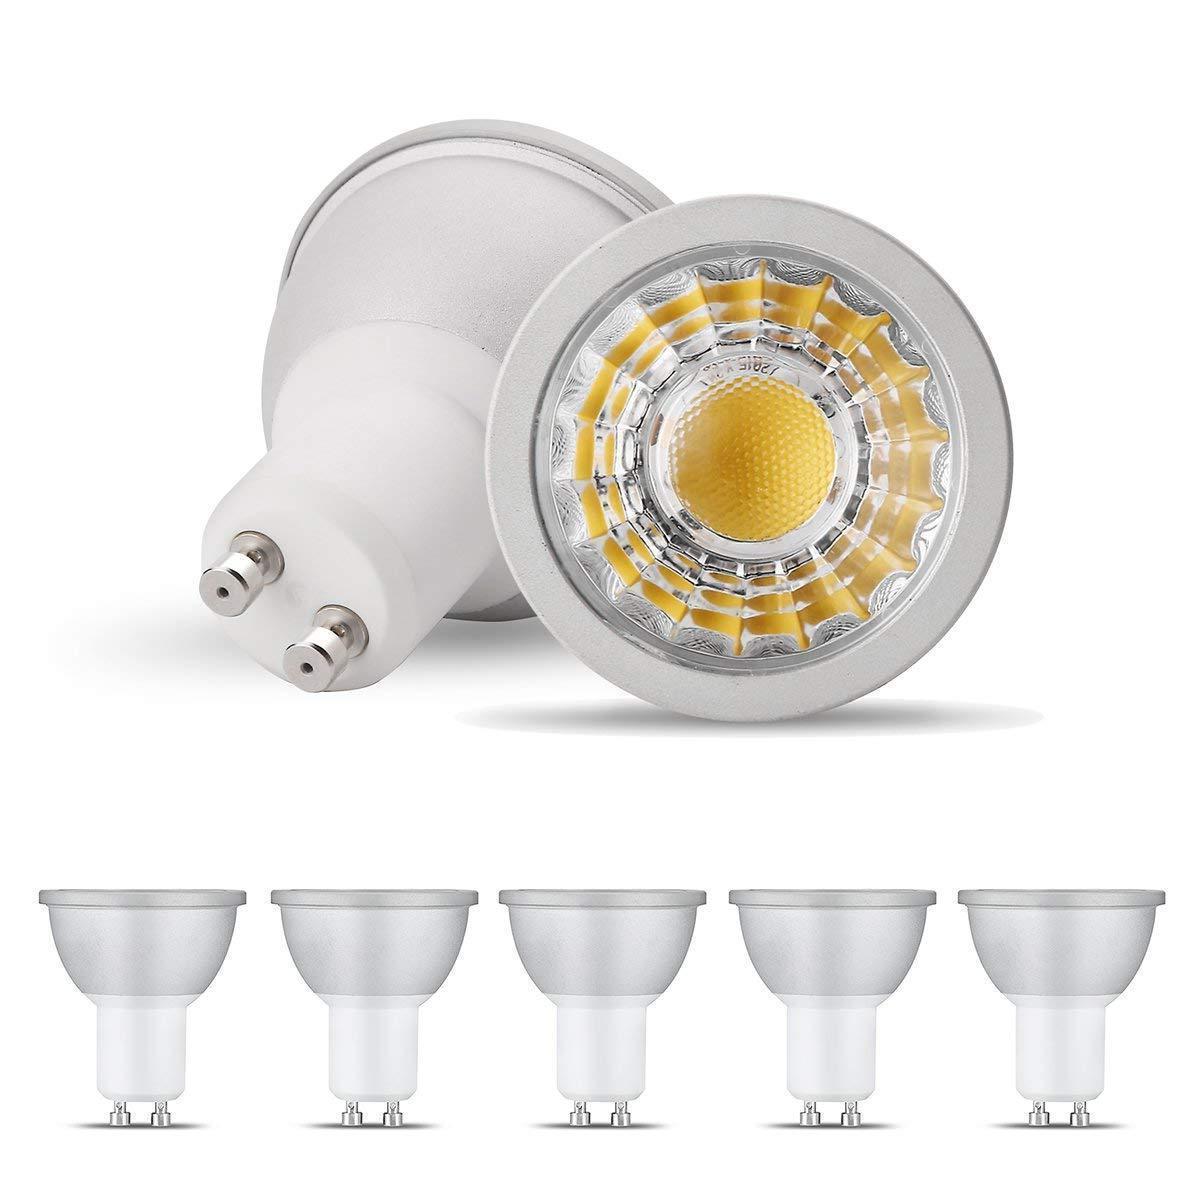 gu10 5w cob led nondimmable light bulbs